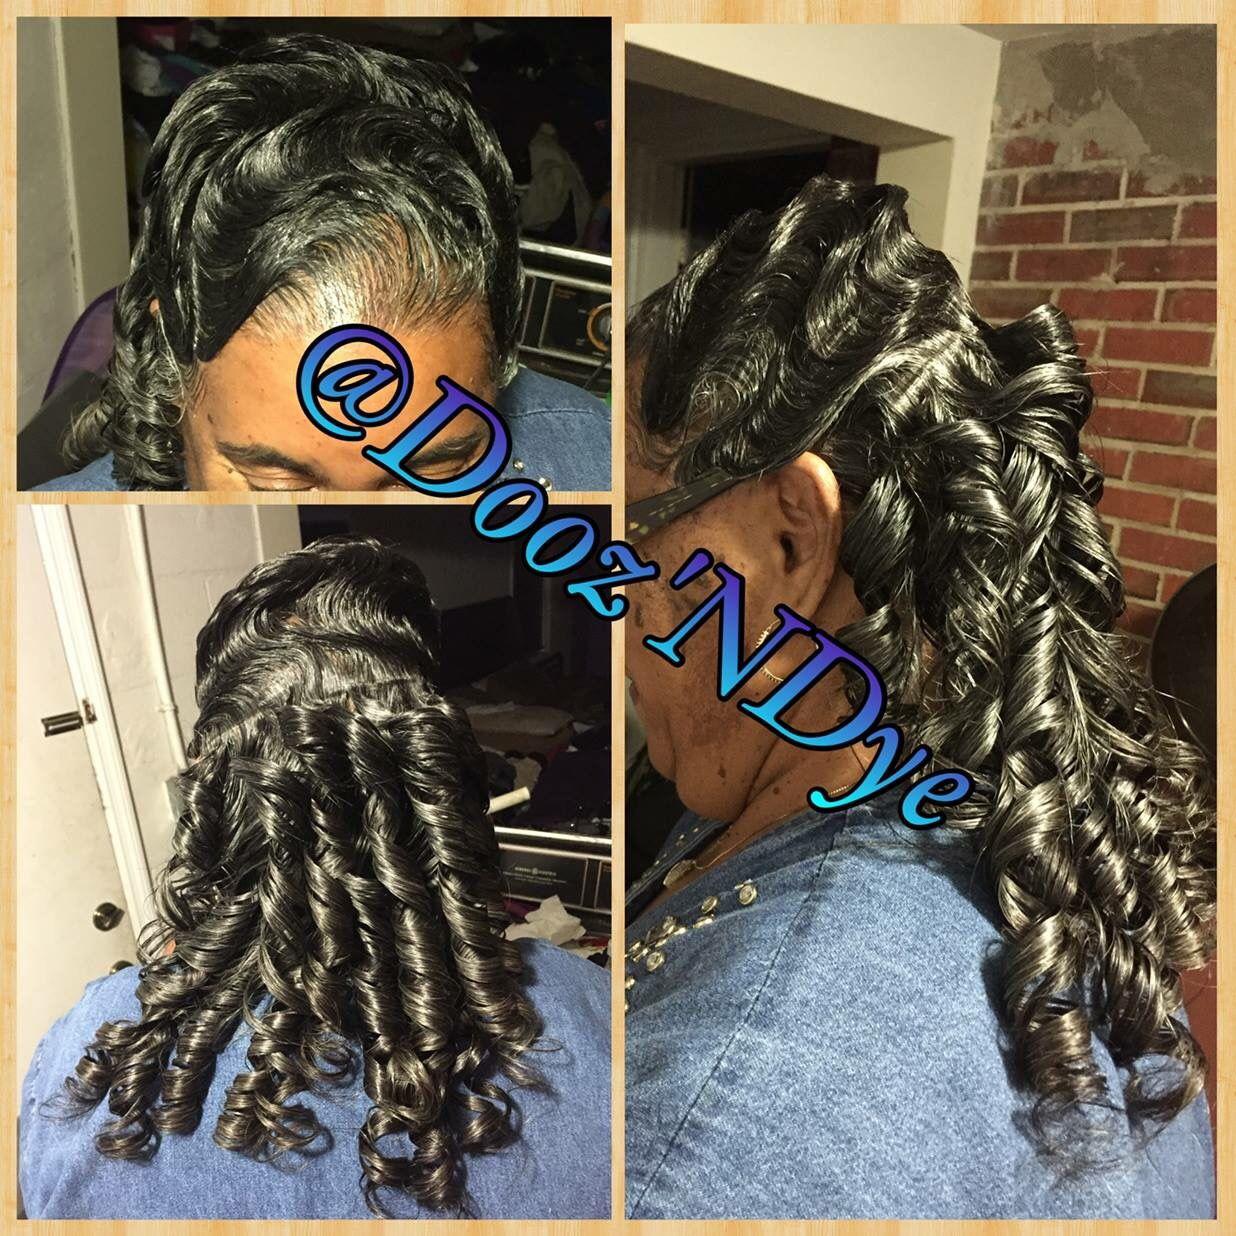 Hairstyles For Black Women Finger Waves Natural Hair Black Hair Care Finger Waves Natural Hair Natural Hair Styles Hair Waves